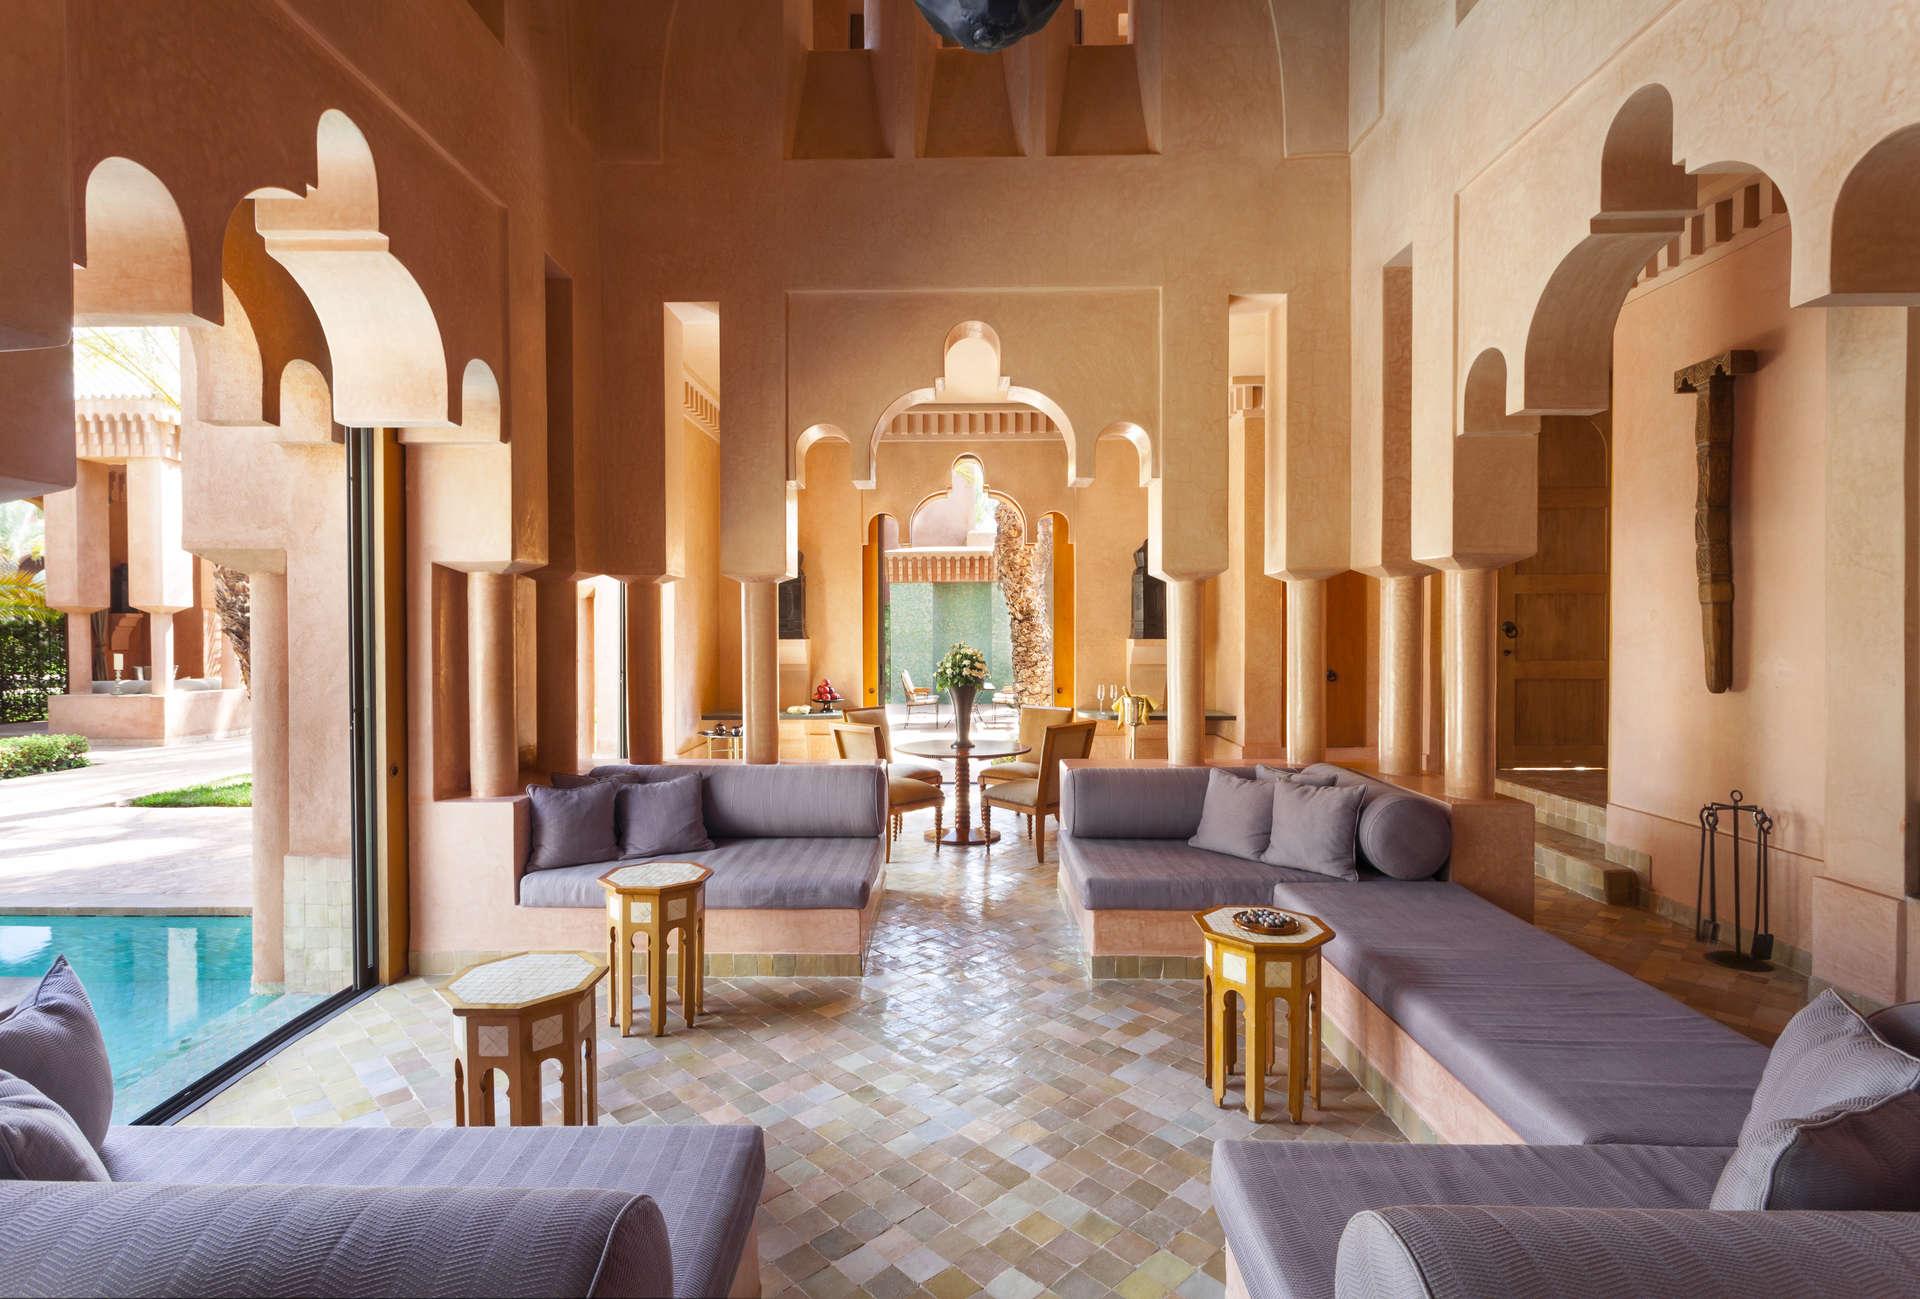 Luxury villa rentals africa - Morocco - Marrakesh - No location 4 - Maison Jardin | Amanjena - Image 1/7